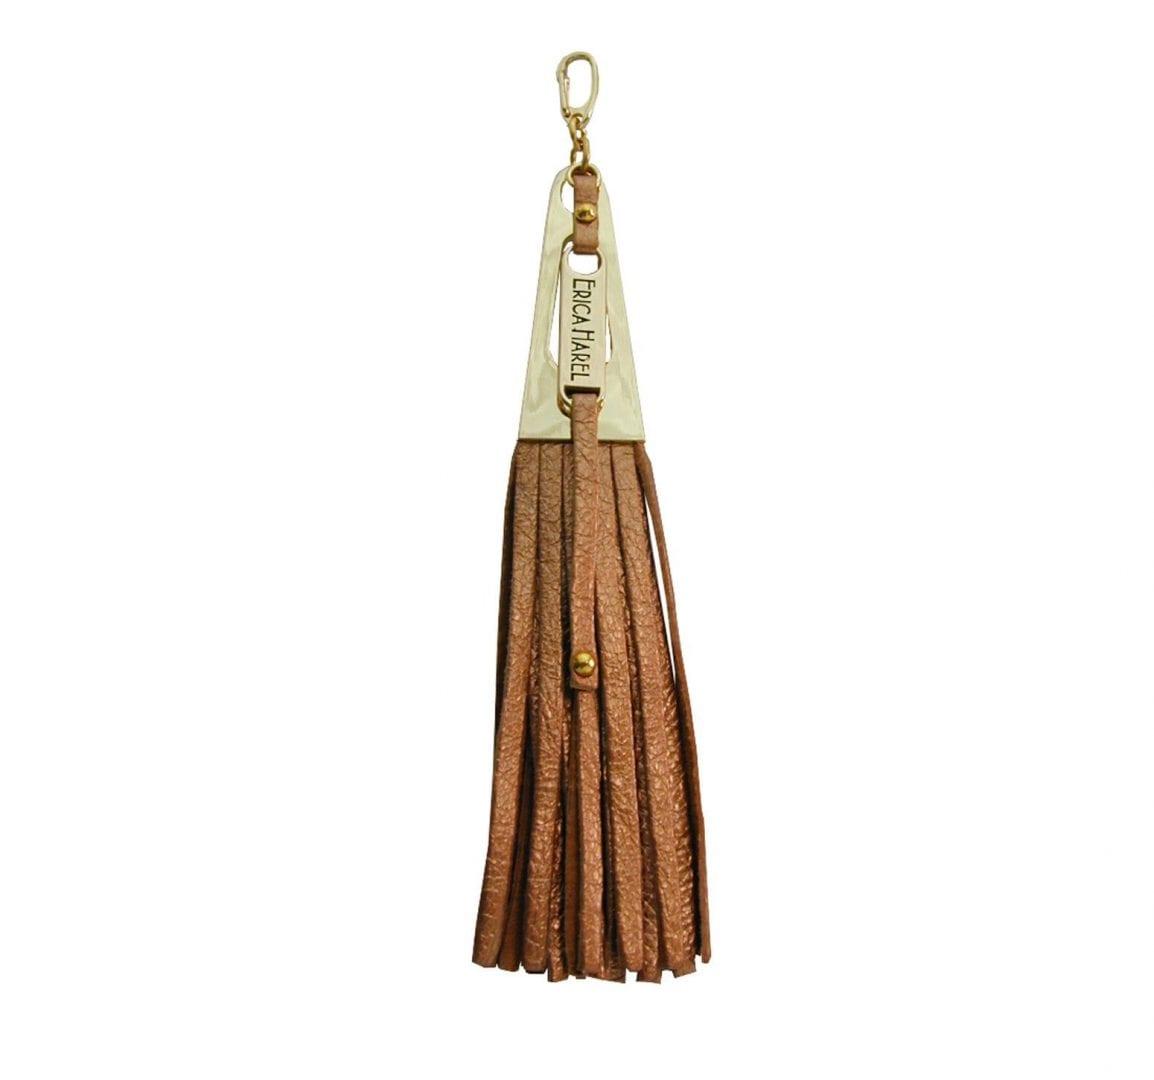 rose gold leather tassel purse charm